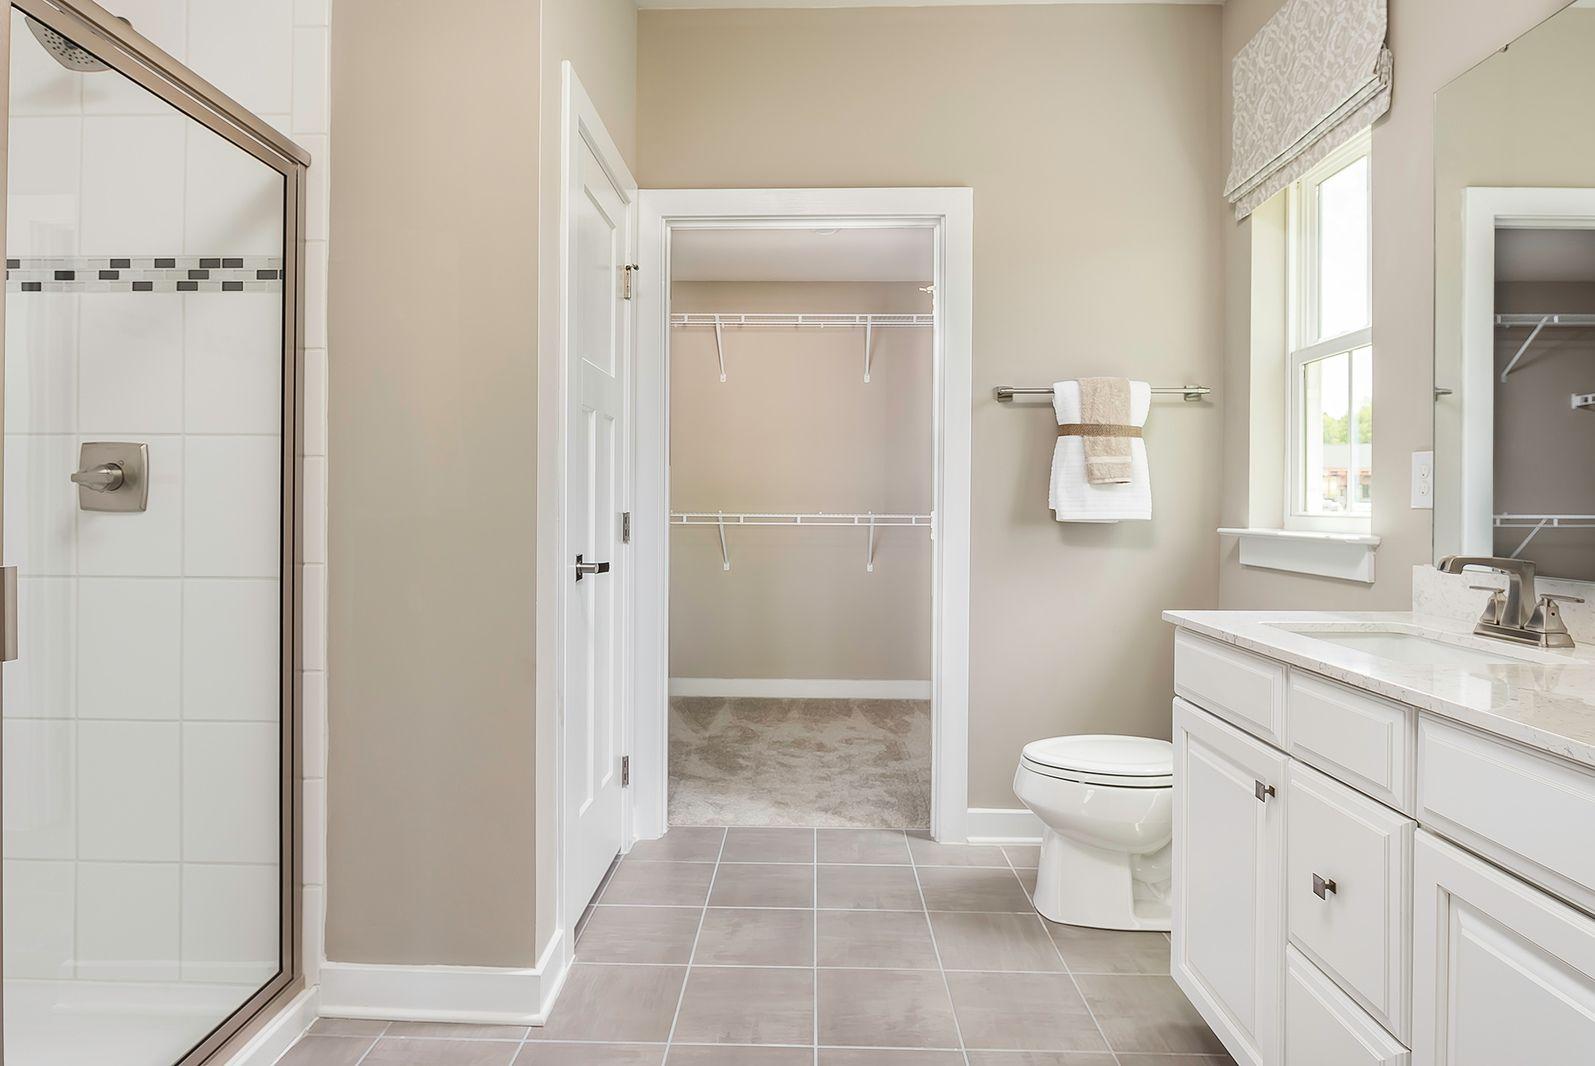 Bathroom featured in the Bramante Ranch By Ryan Homes in Washington, VA